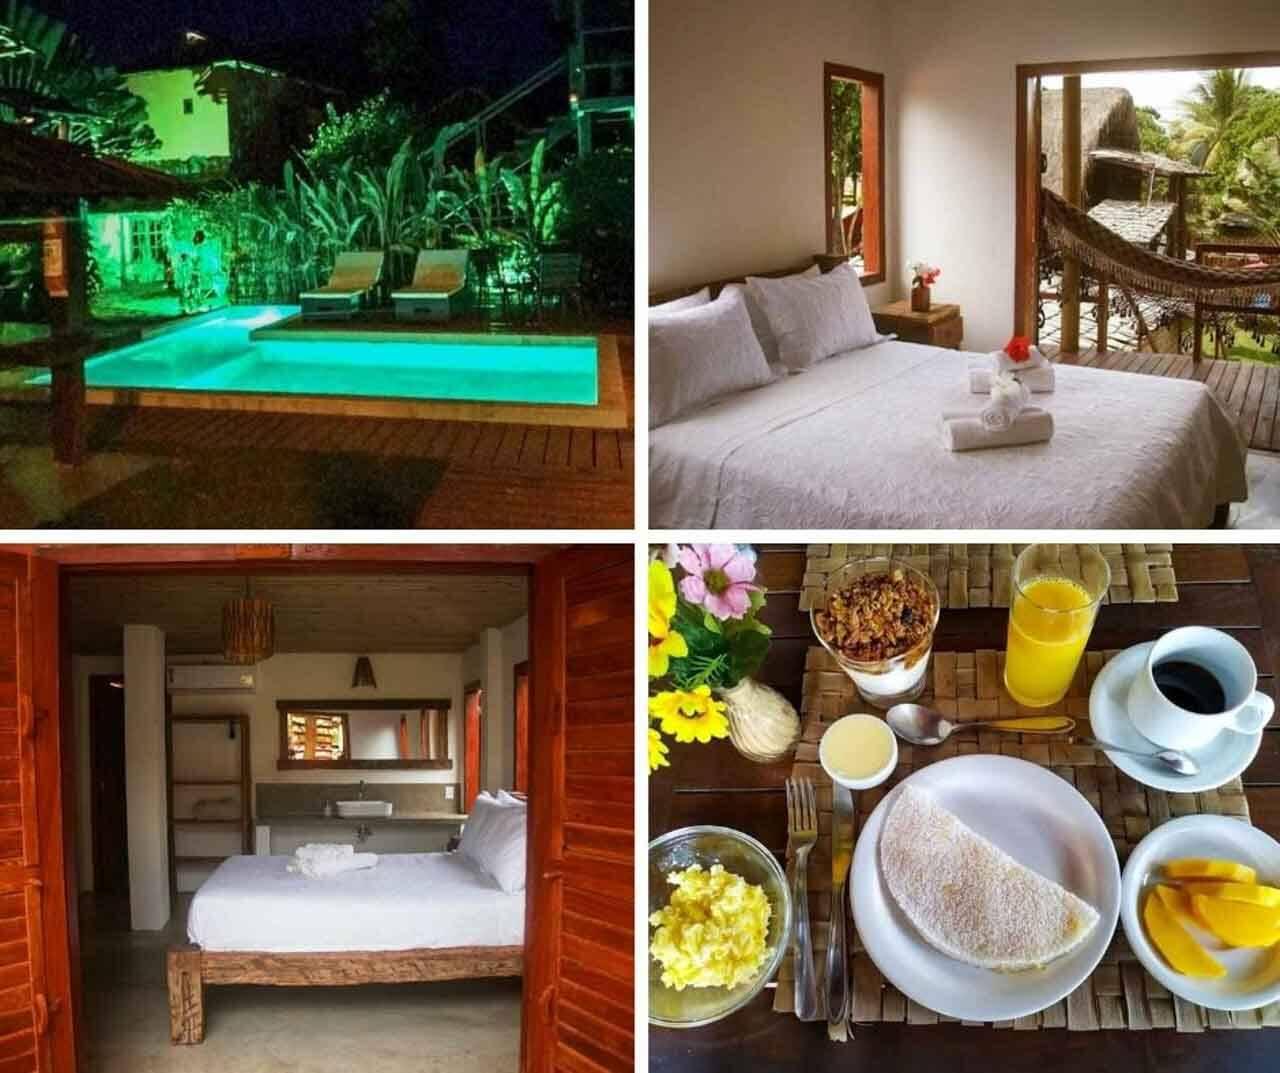 La Villa é uma pousada barata e perto da praia em Caraíva.